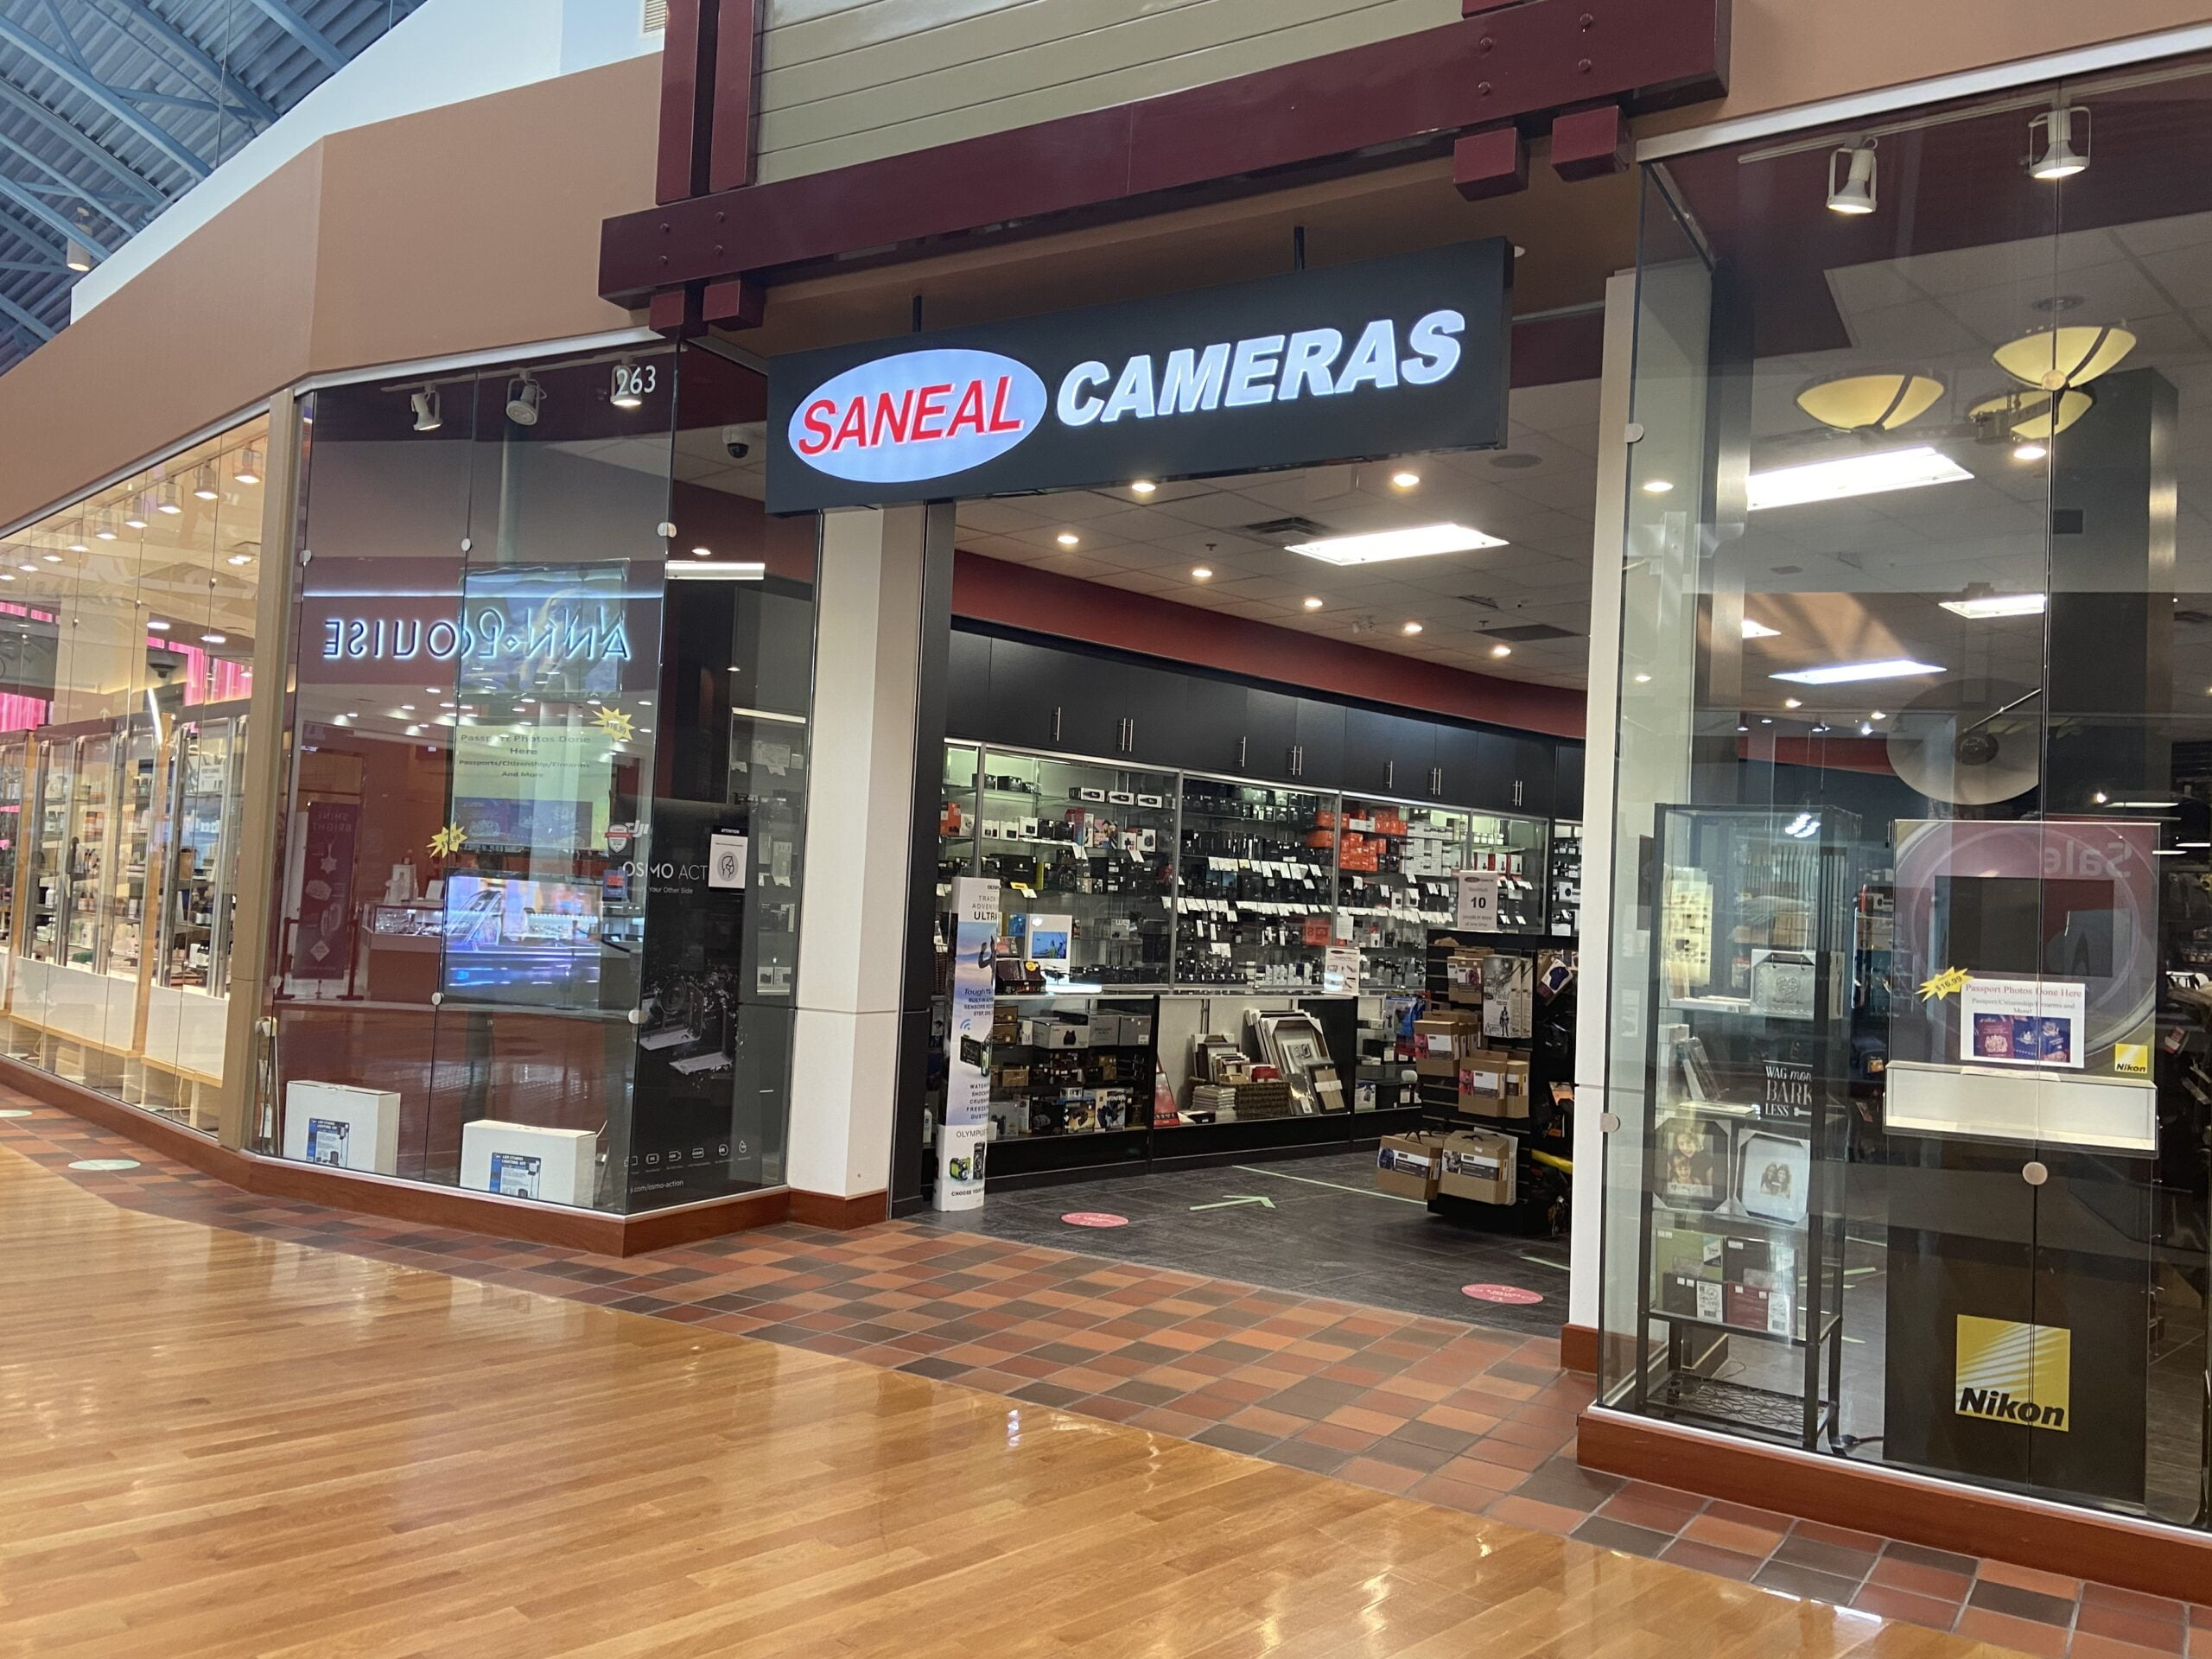 Saneal Cameras at CrossIron Mills